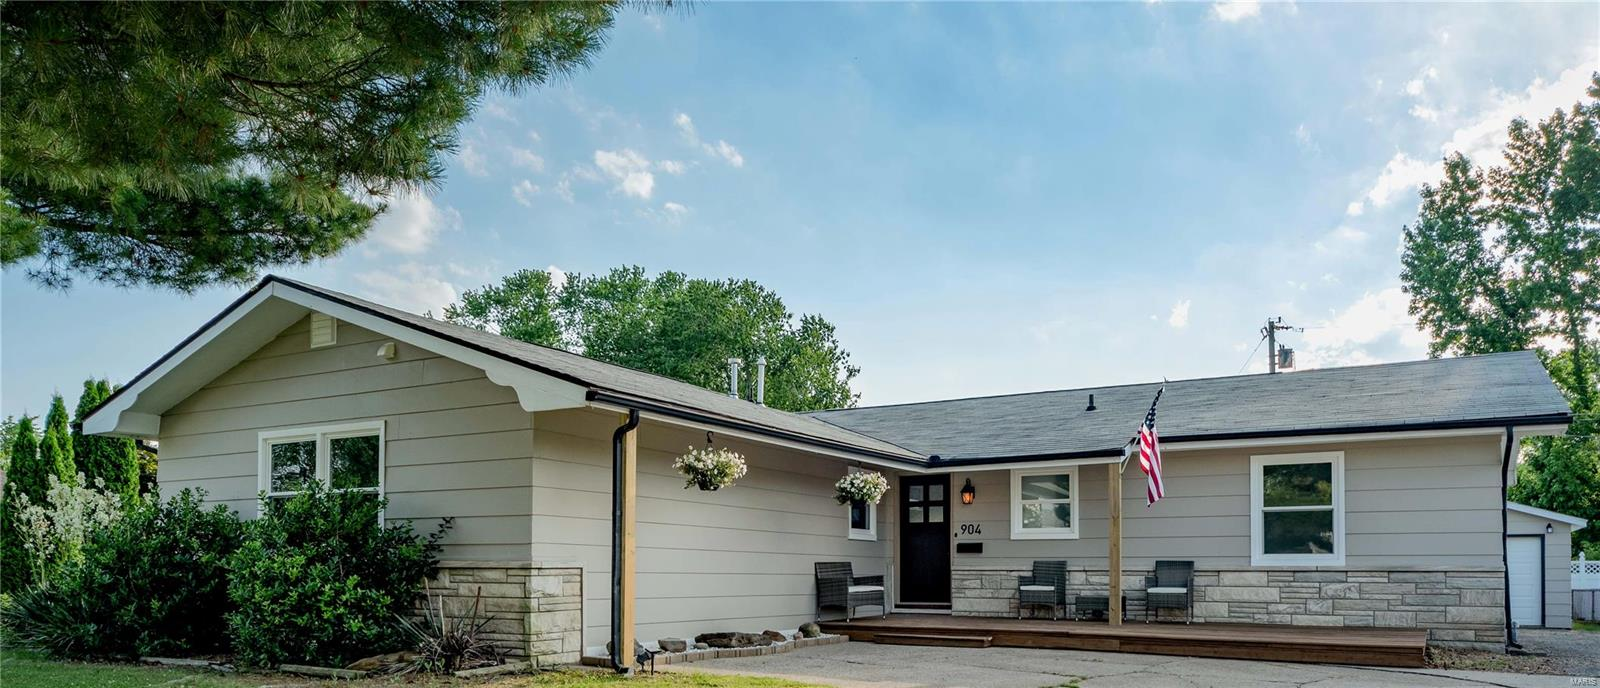 904 Cedar Property Photo 1